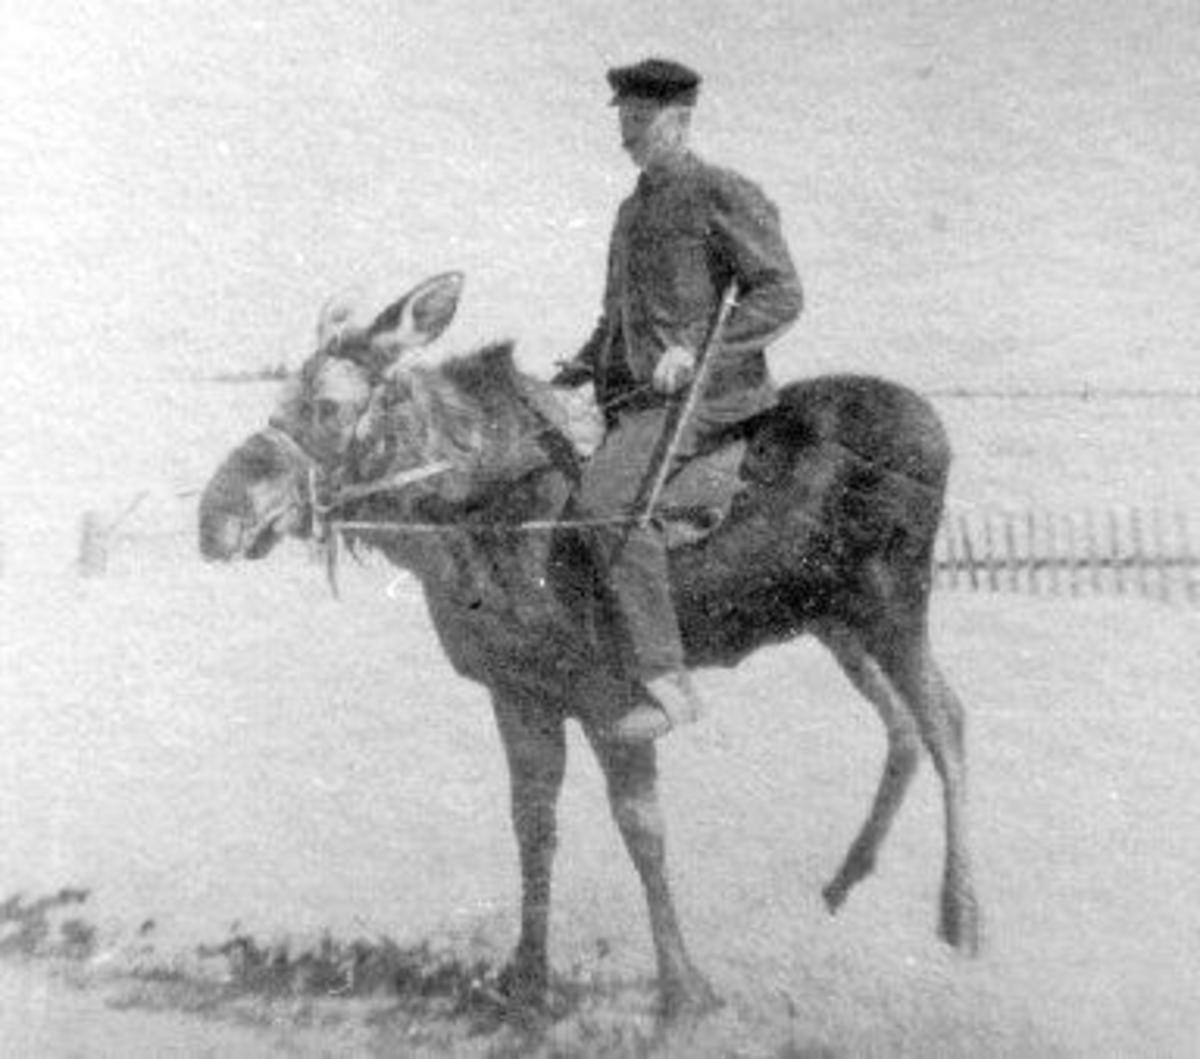 Russian moose rider